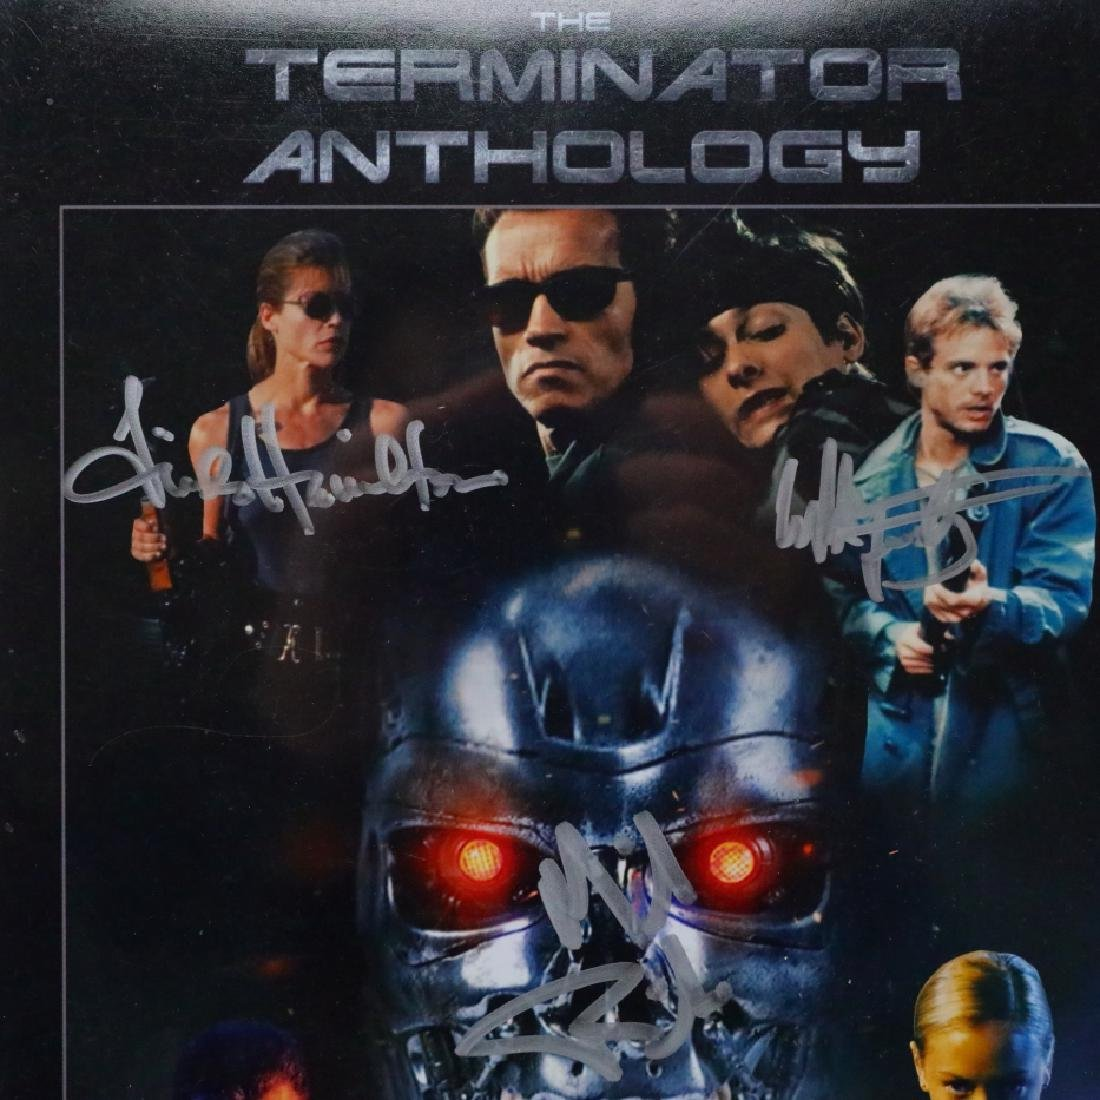 The Terminator Cast Signed Photograph W/COA - 2